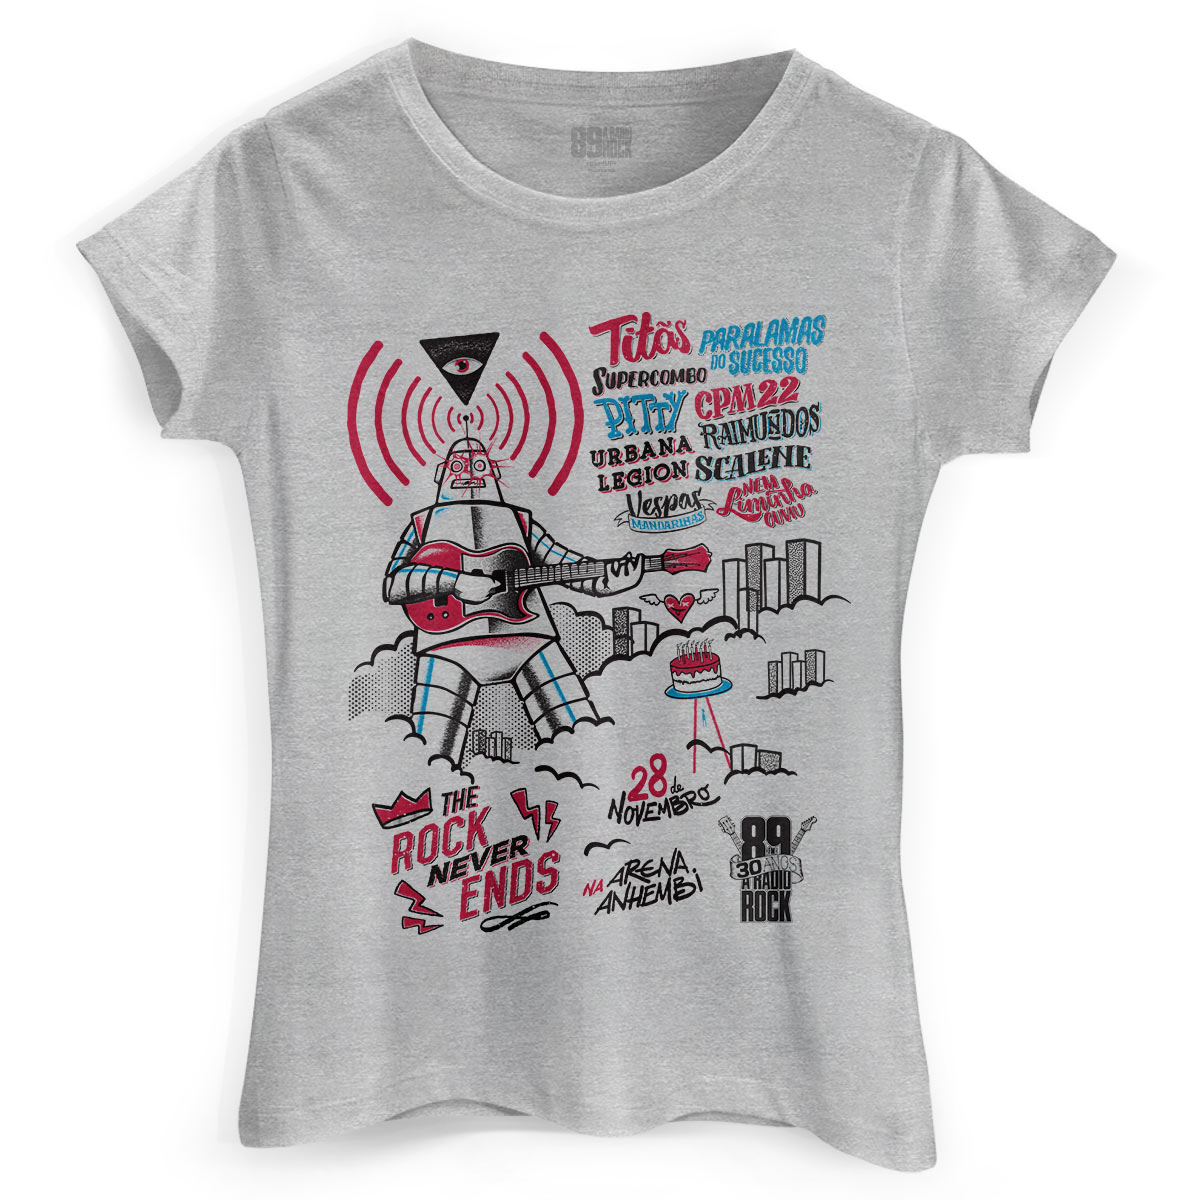 Camiseta Feminina 89FM A Rádio Rock 30 Anos Pôster Gray